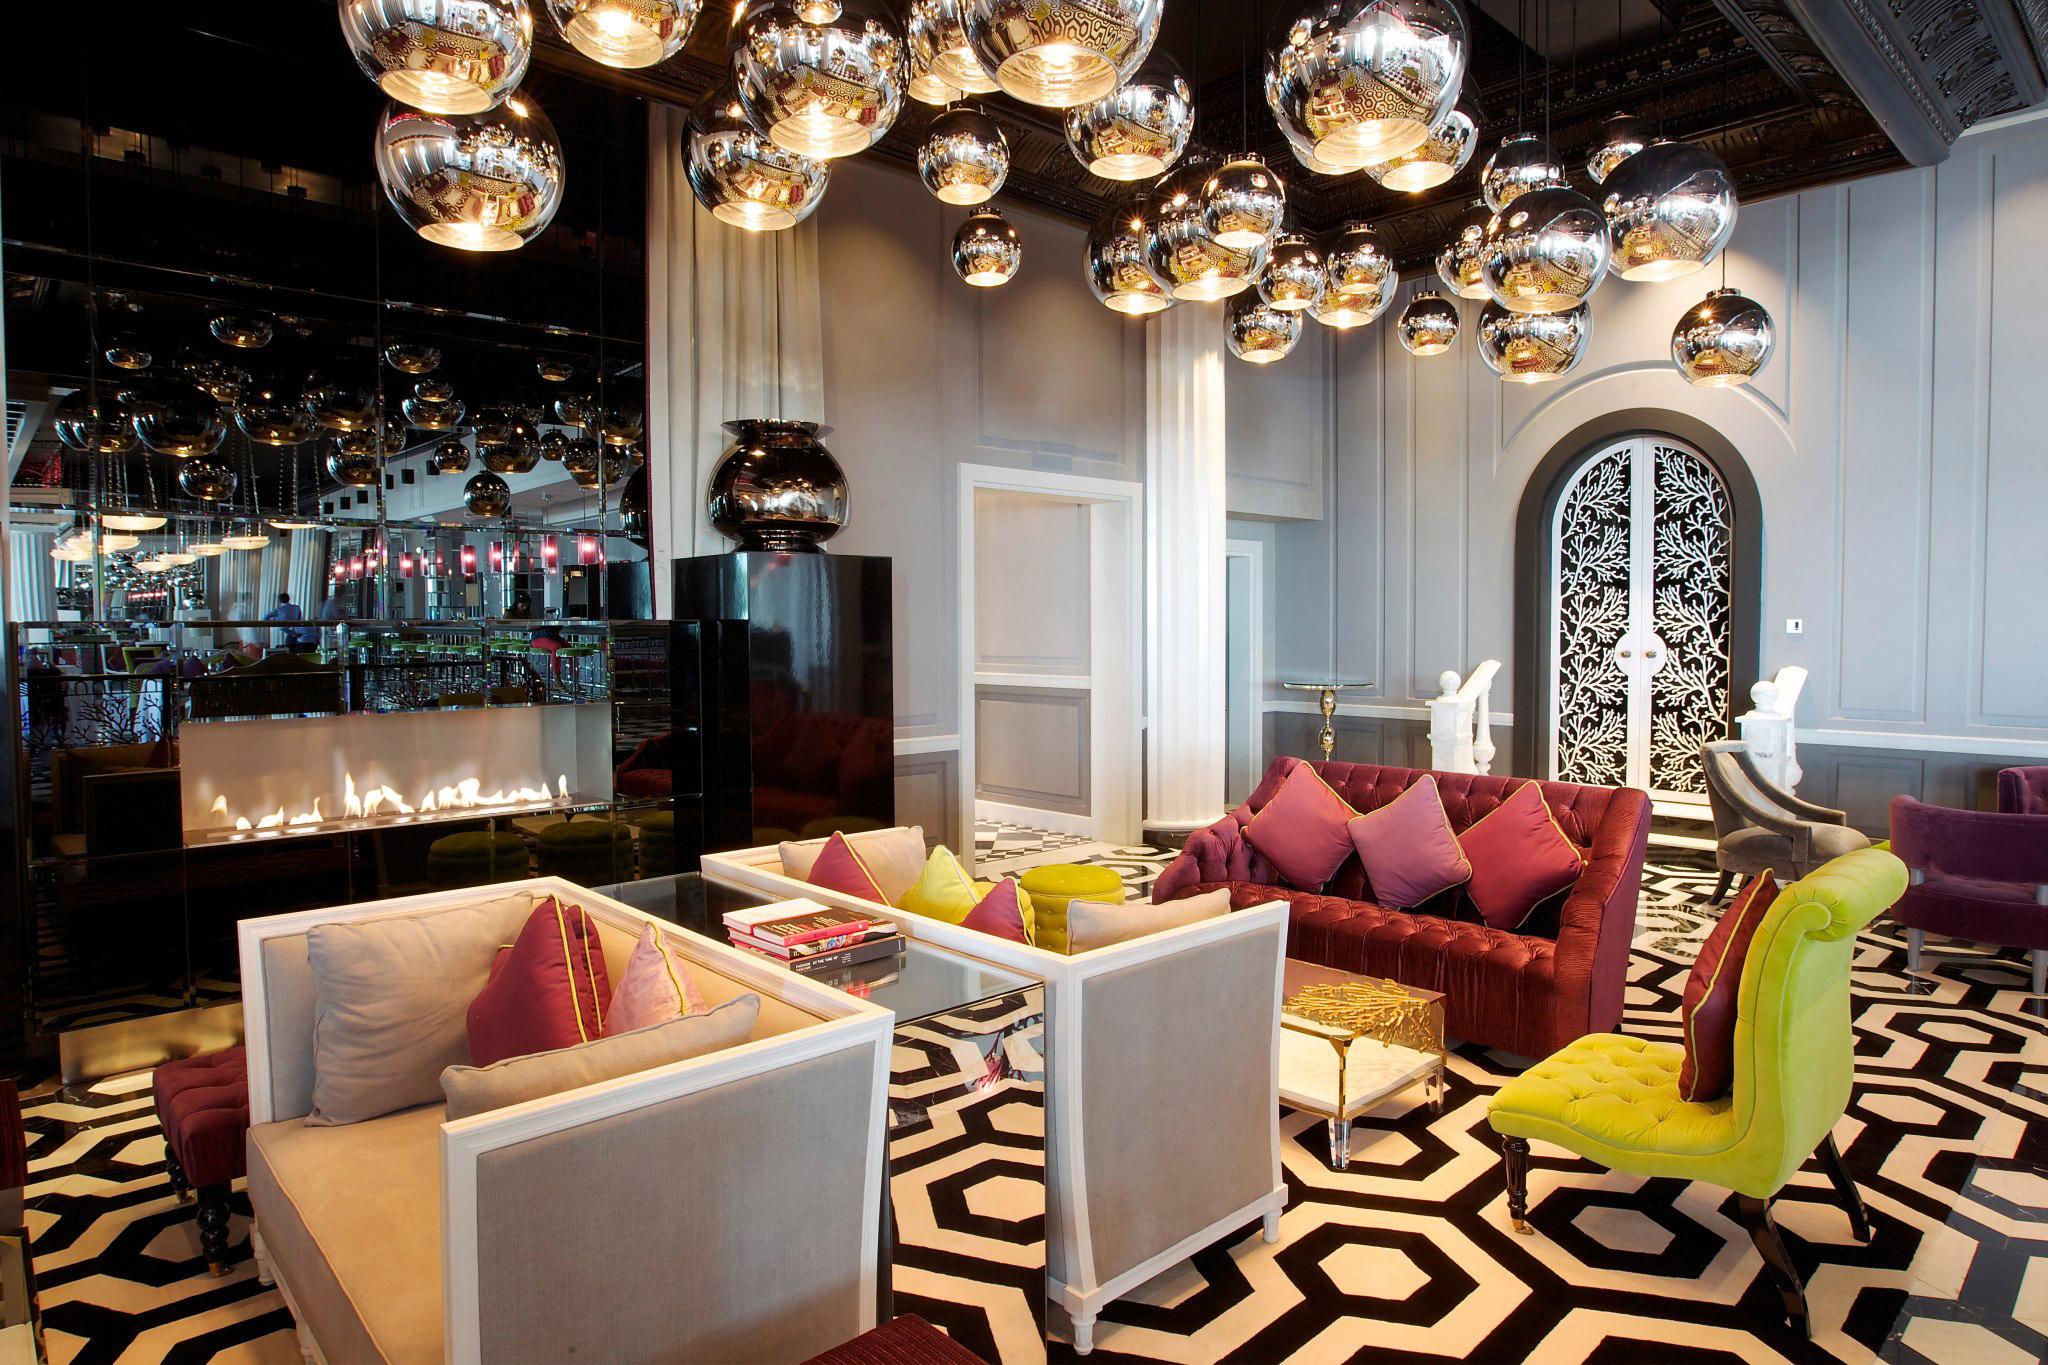 Fire-Line-Automatic-Planika-Meydan-Jumeirah-Beach-Residence-Dubai-UAE-Design-CM-Design.jpg